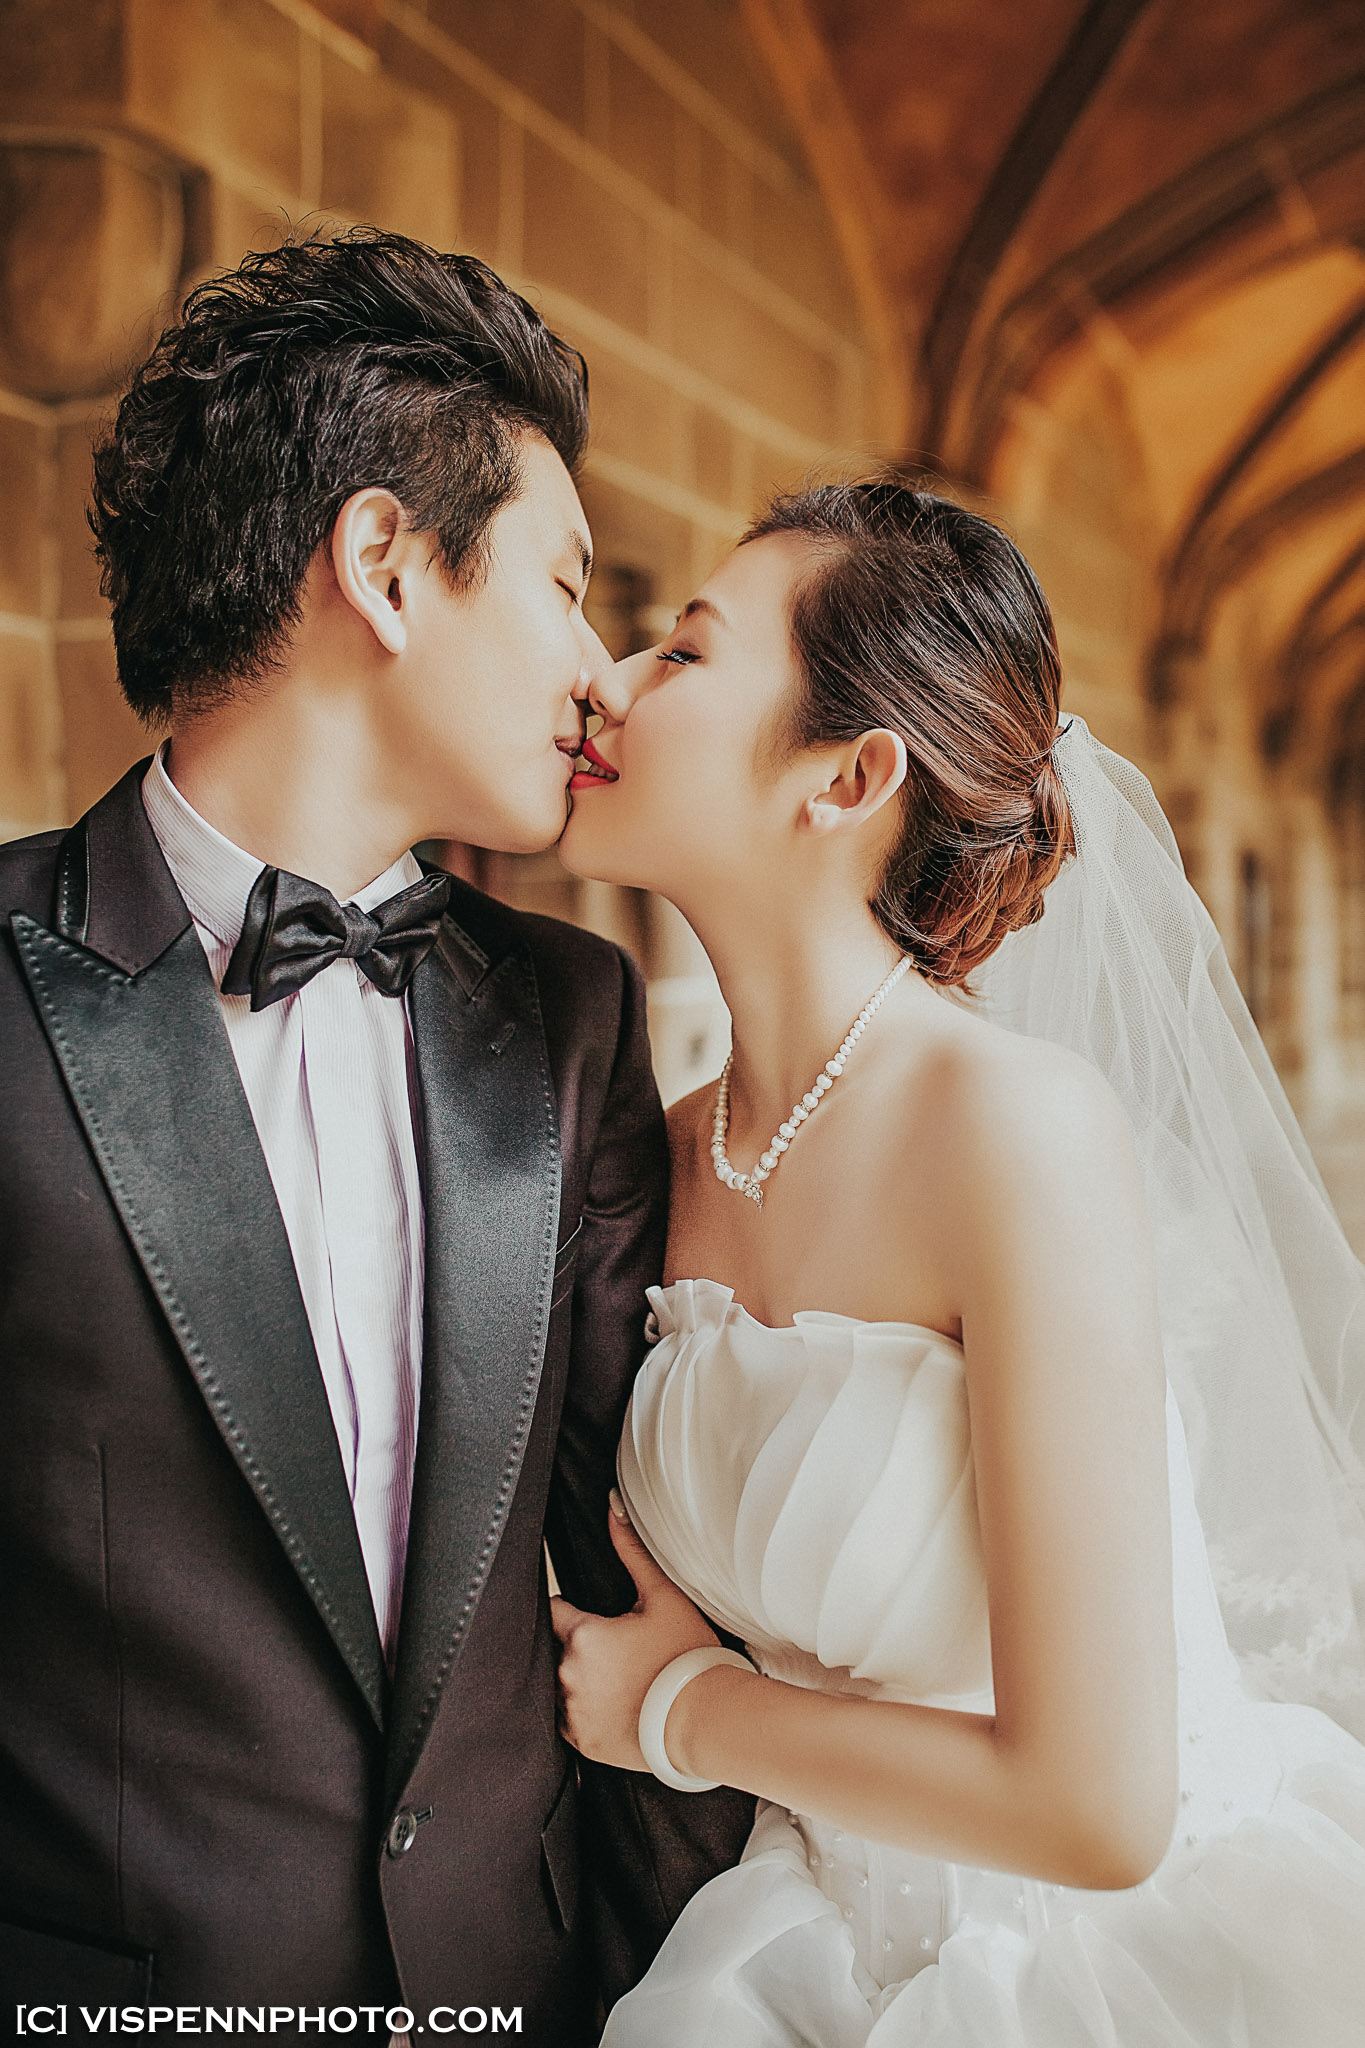 PRE WEDDING Photography Melbourne VISPENN 墨尔本 婚纱照 结婚照 婚纱摄影 5D3 2658